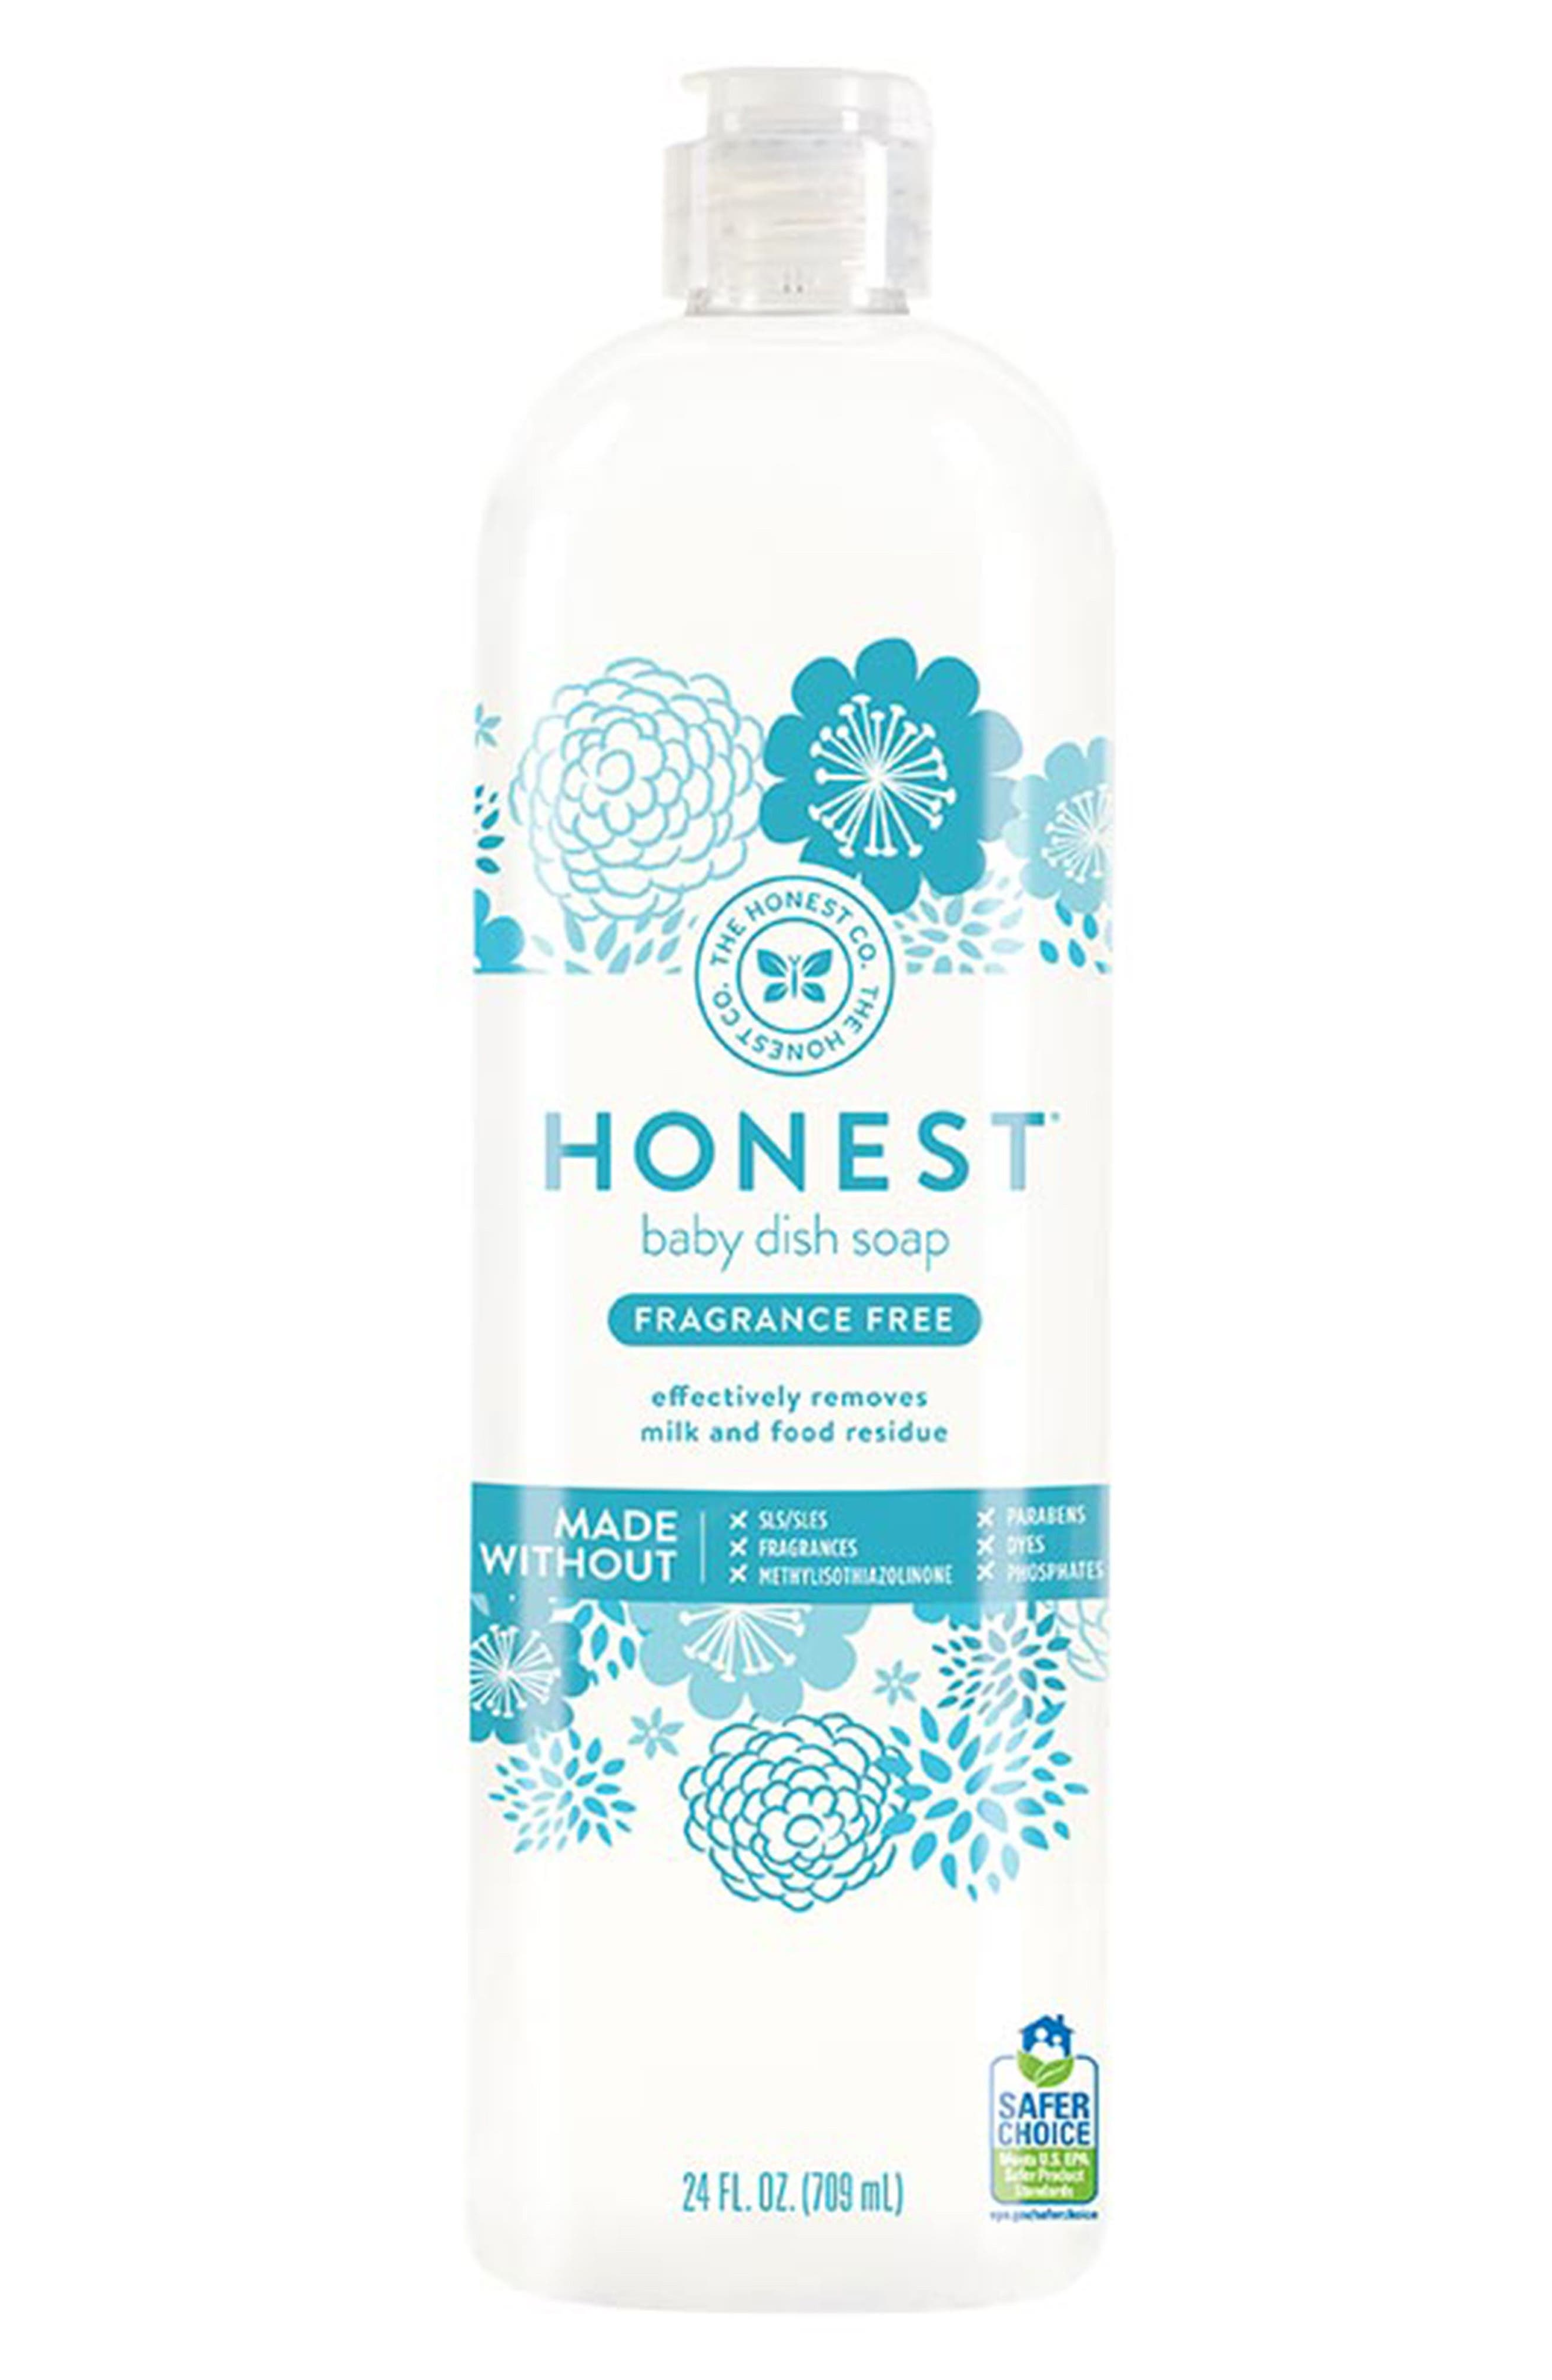 The Honest Company Fragrance Free Baby Dish Soap